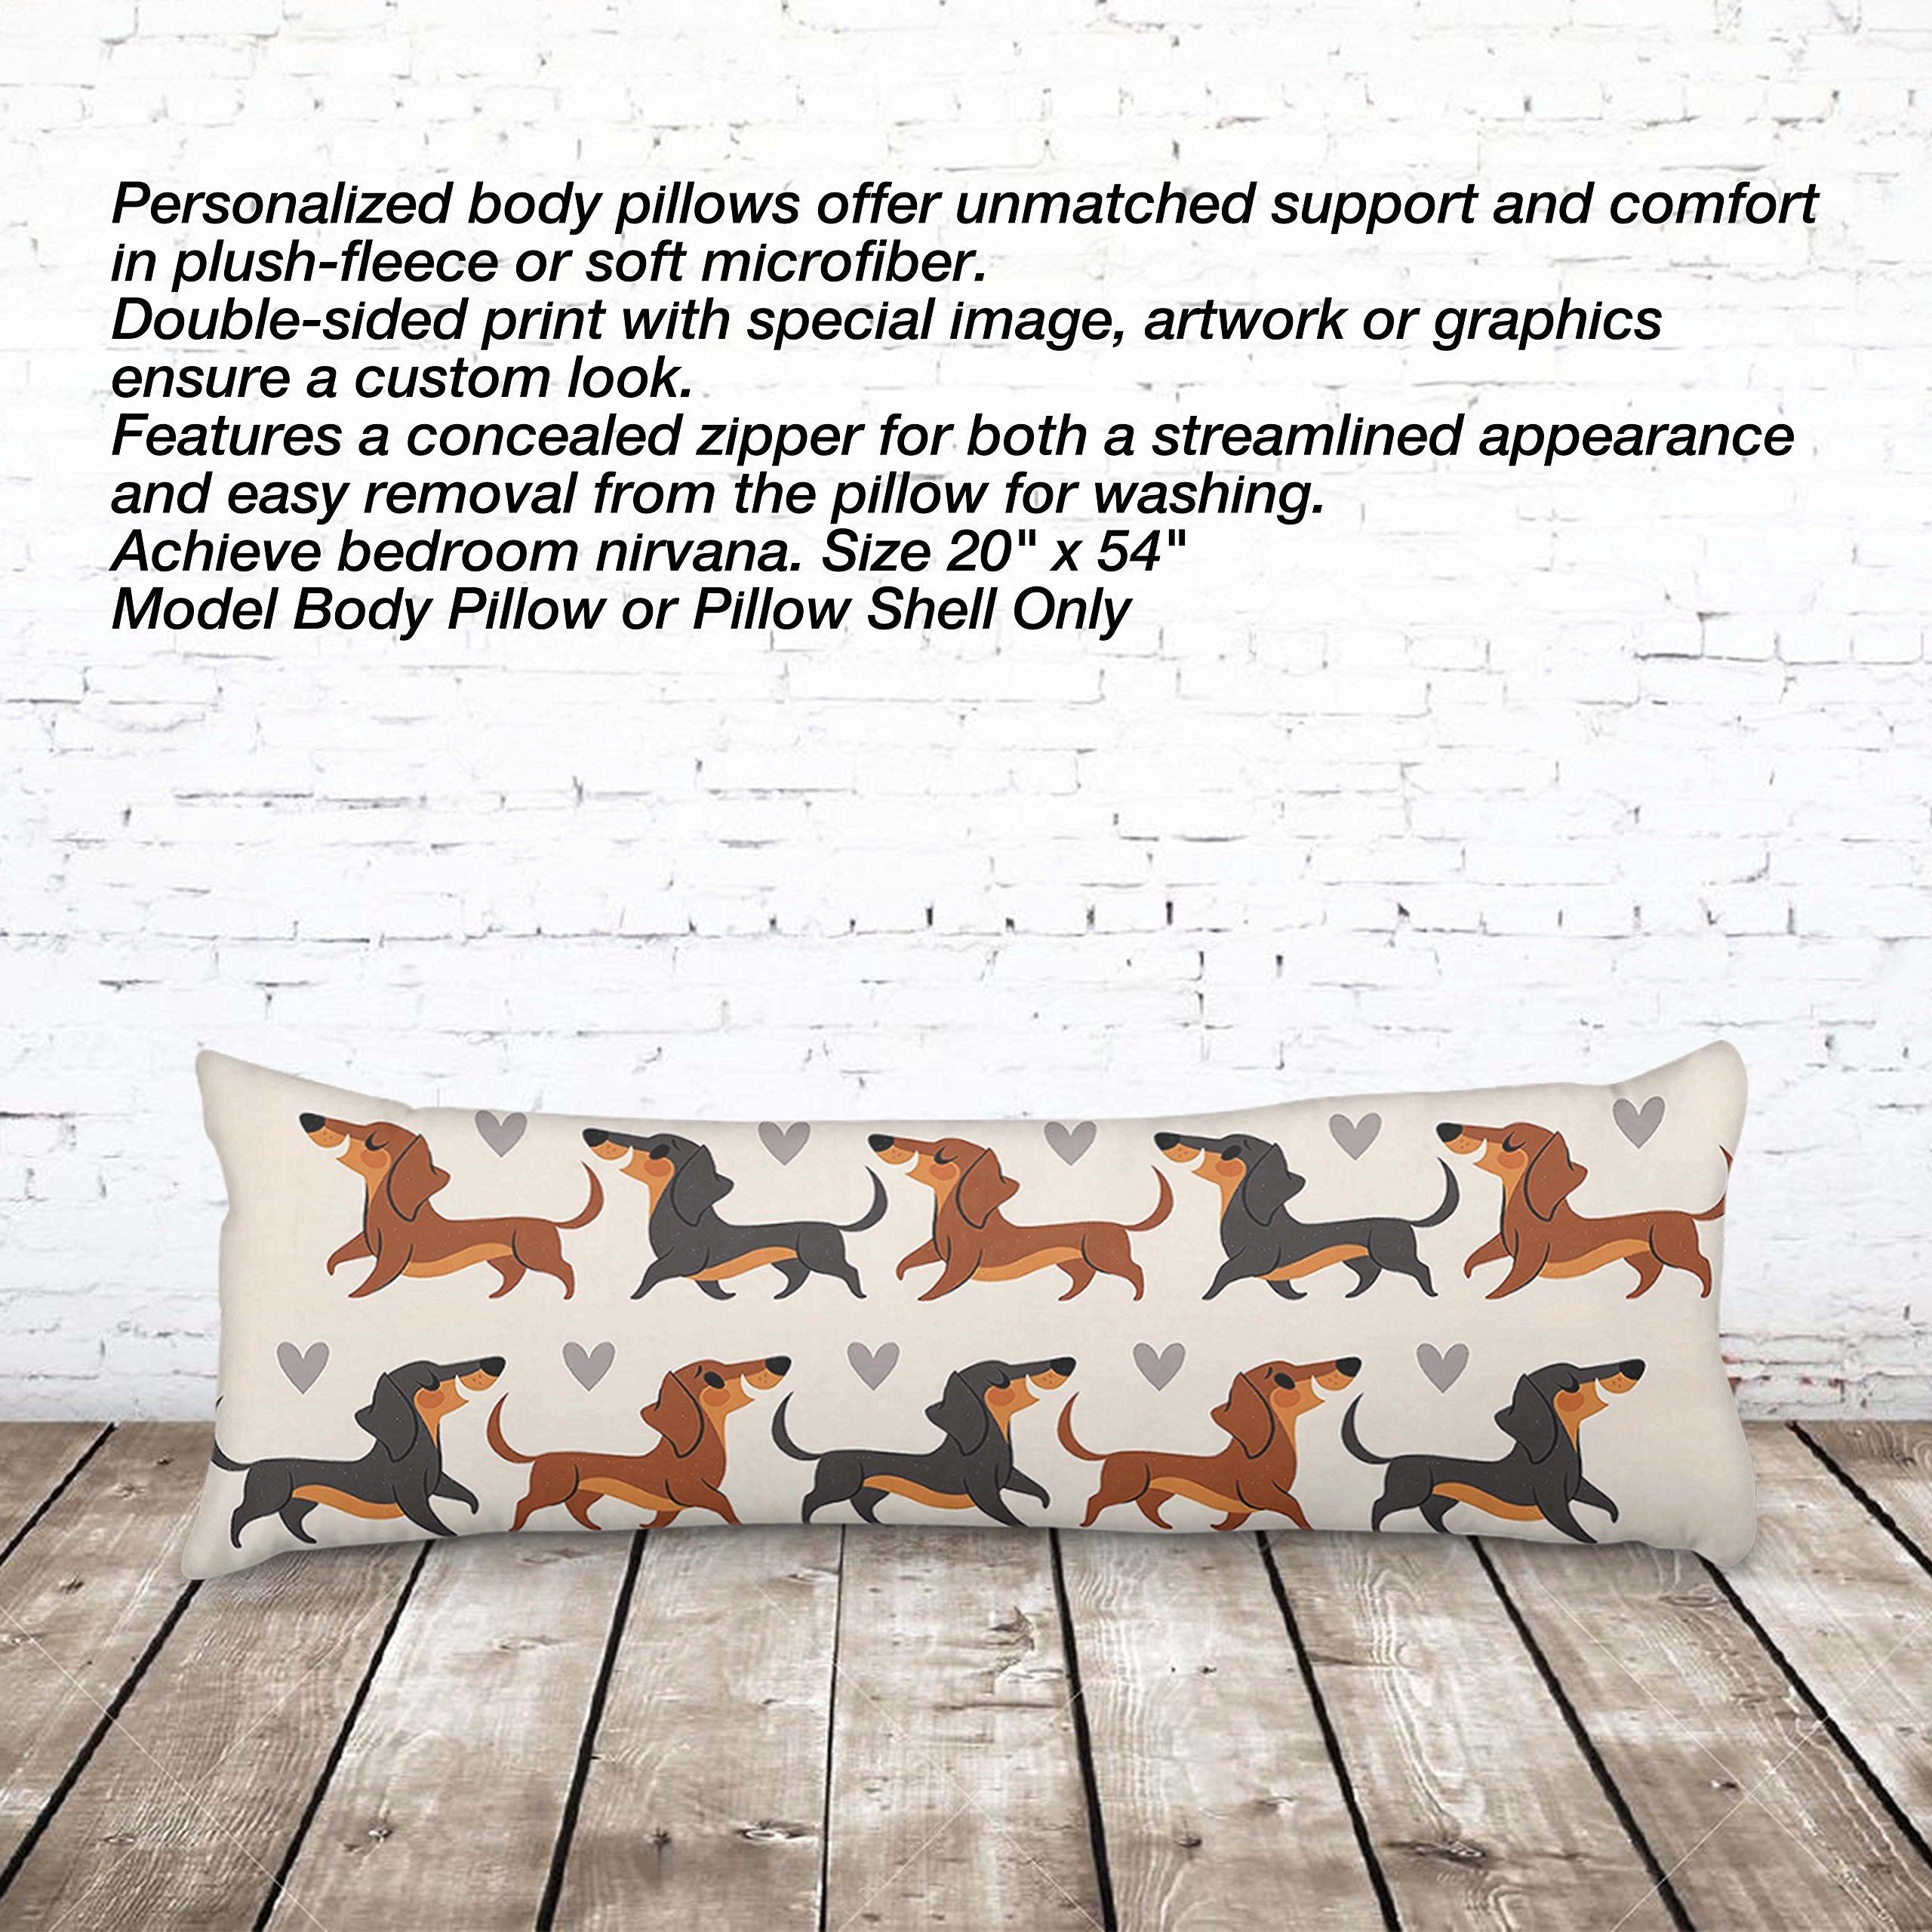 VOTANTA - Dachshund Cute Body Pillows (Body Pillow 100% Microfiber, 20x54'')